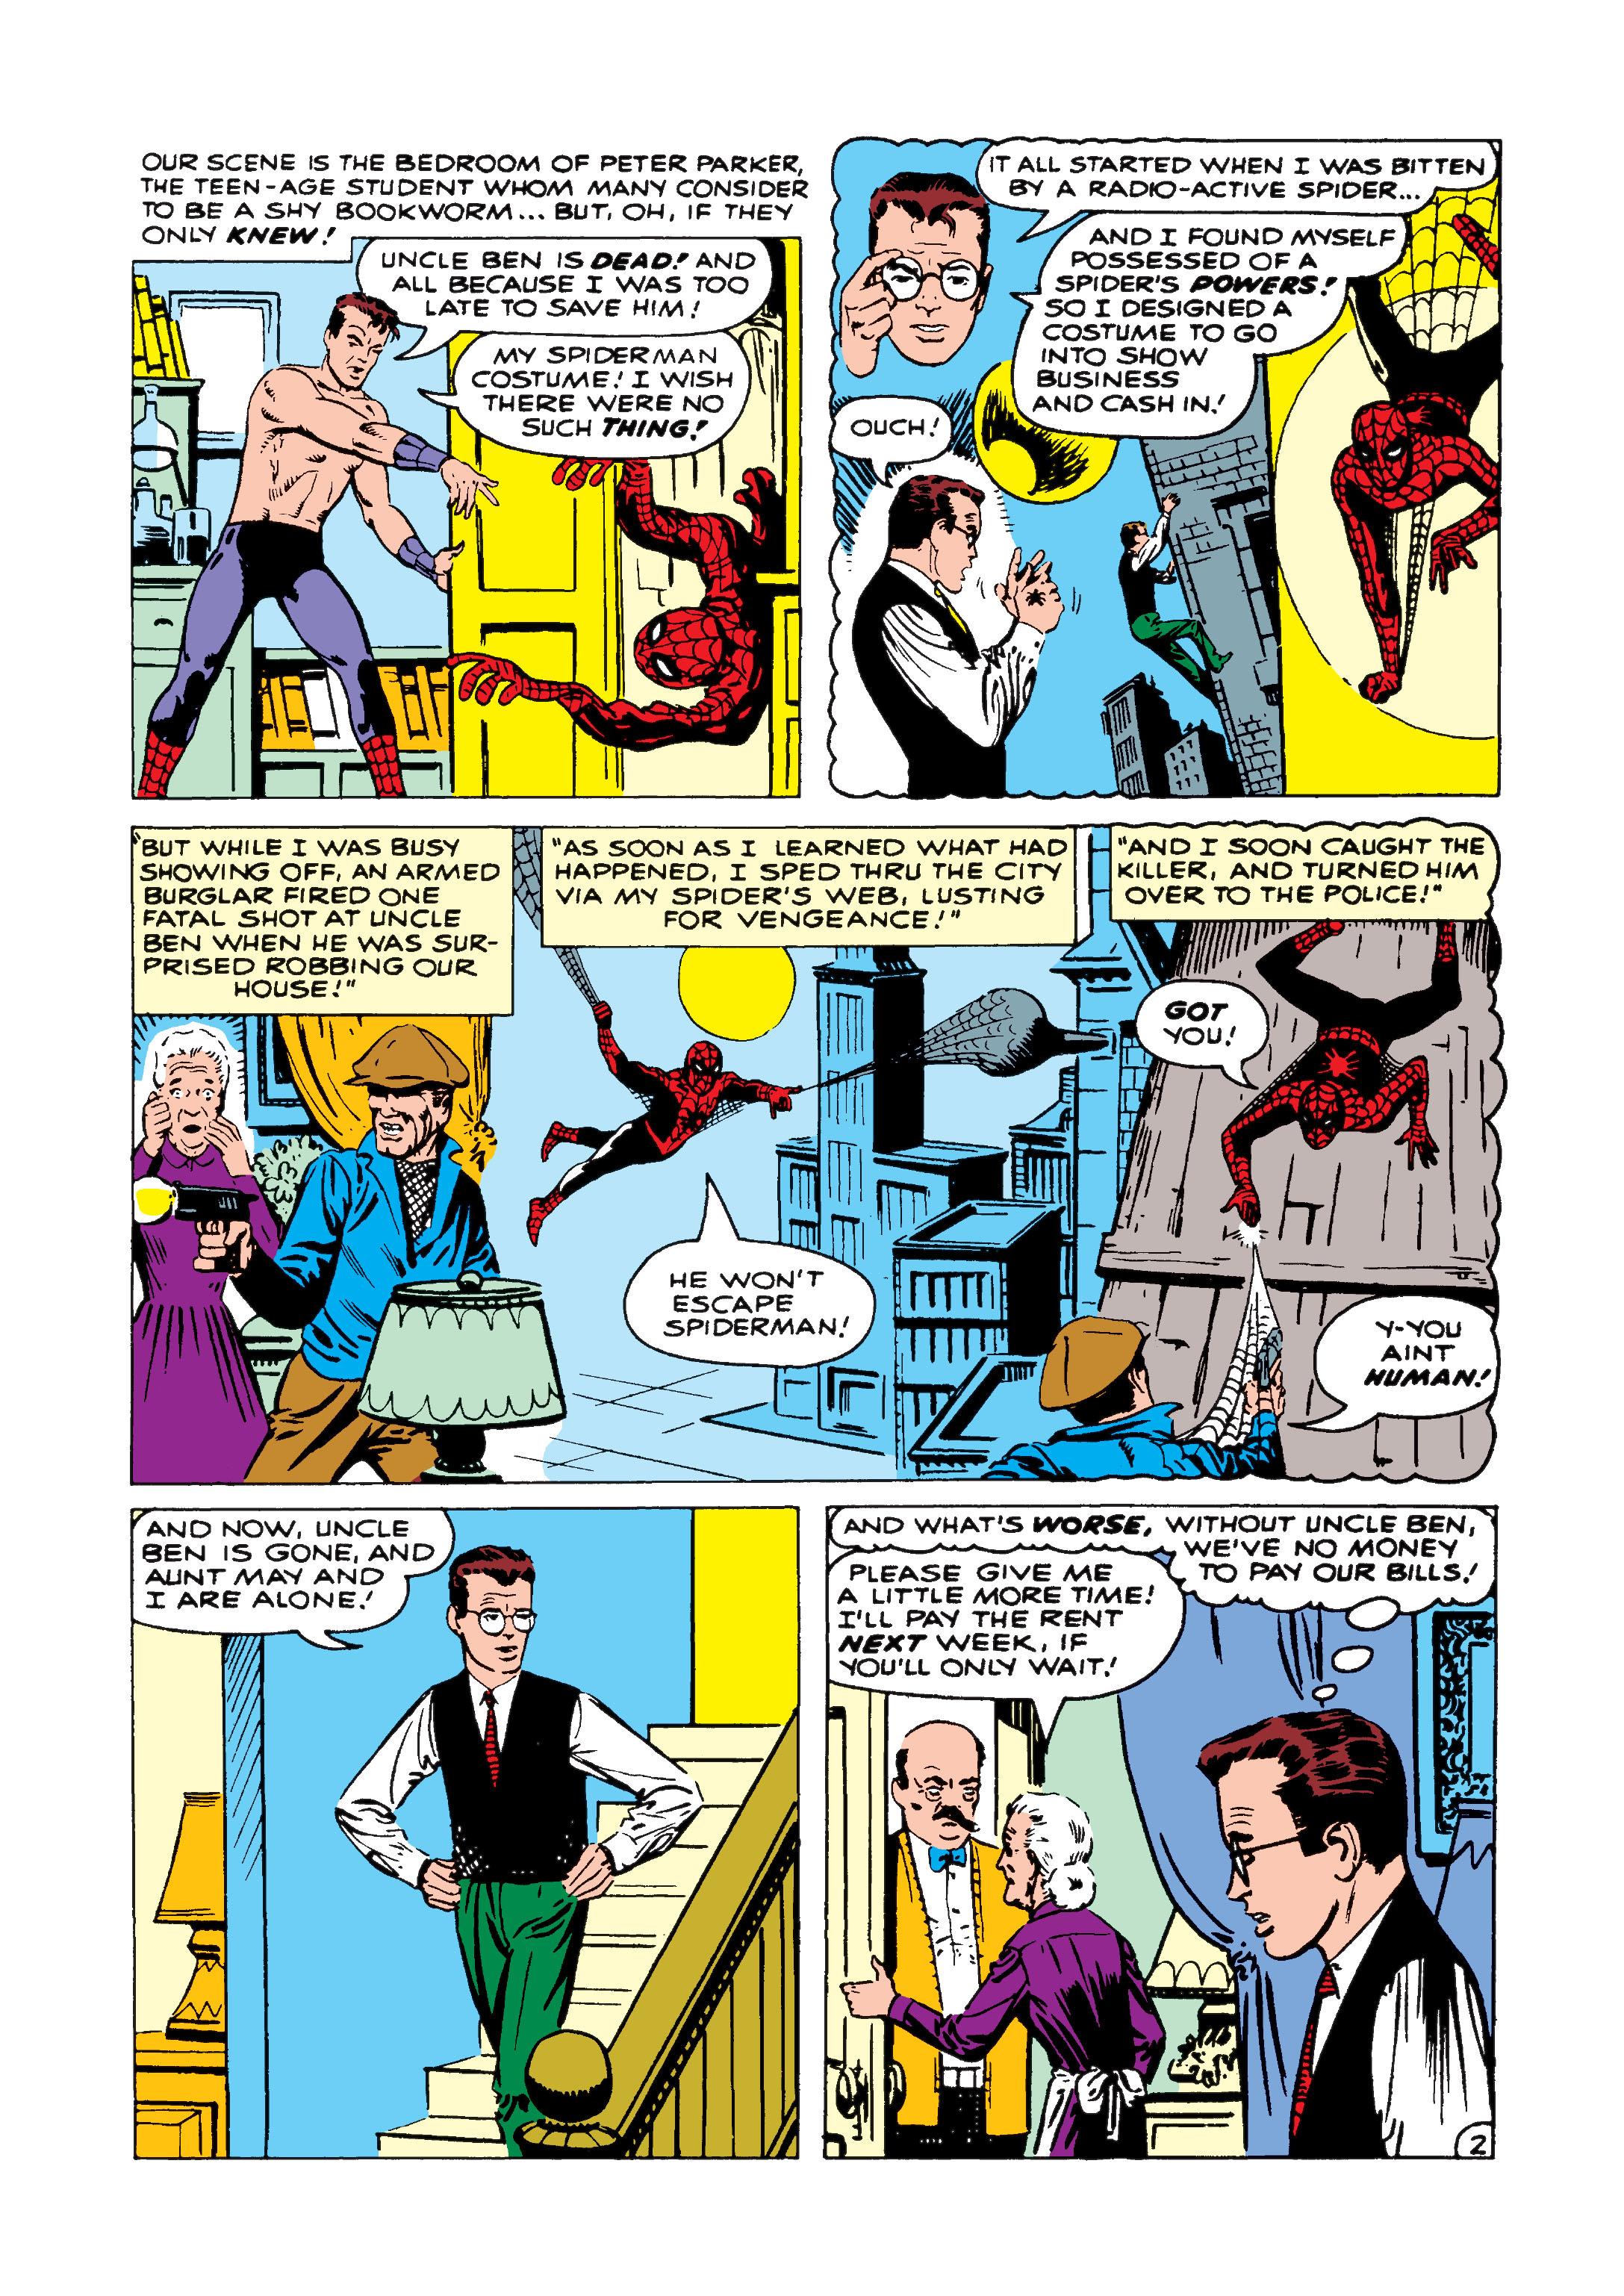 Spider-Man Character Study ― The Ultimate Essay KfXqR2gWfCJNCqrwPVzZ1HADt4r4g0iMbX6nf3qXshwvEaVMfB8hatOyNMa6xNHuMwWaYetG1N_S=s0